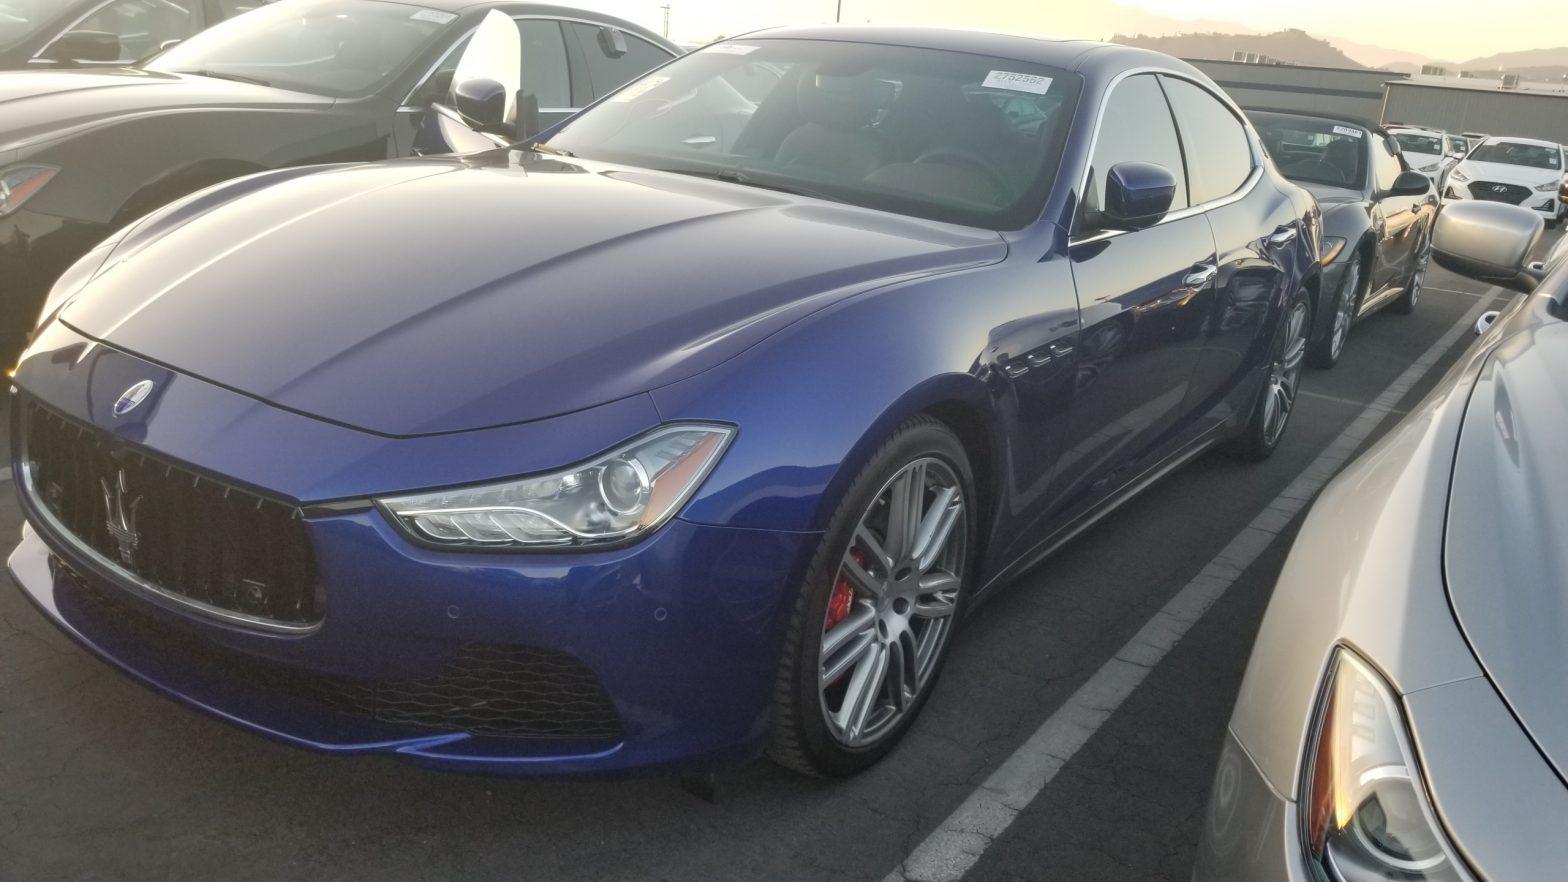 Problem with your Maserati key